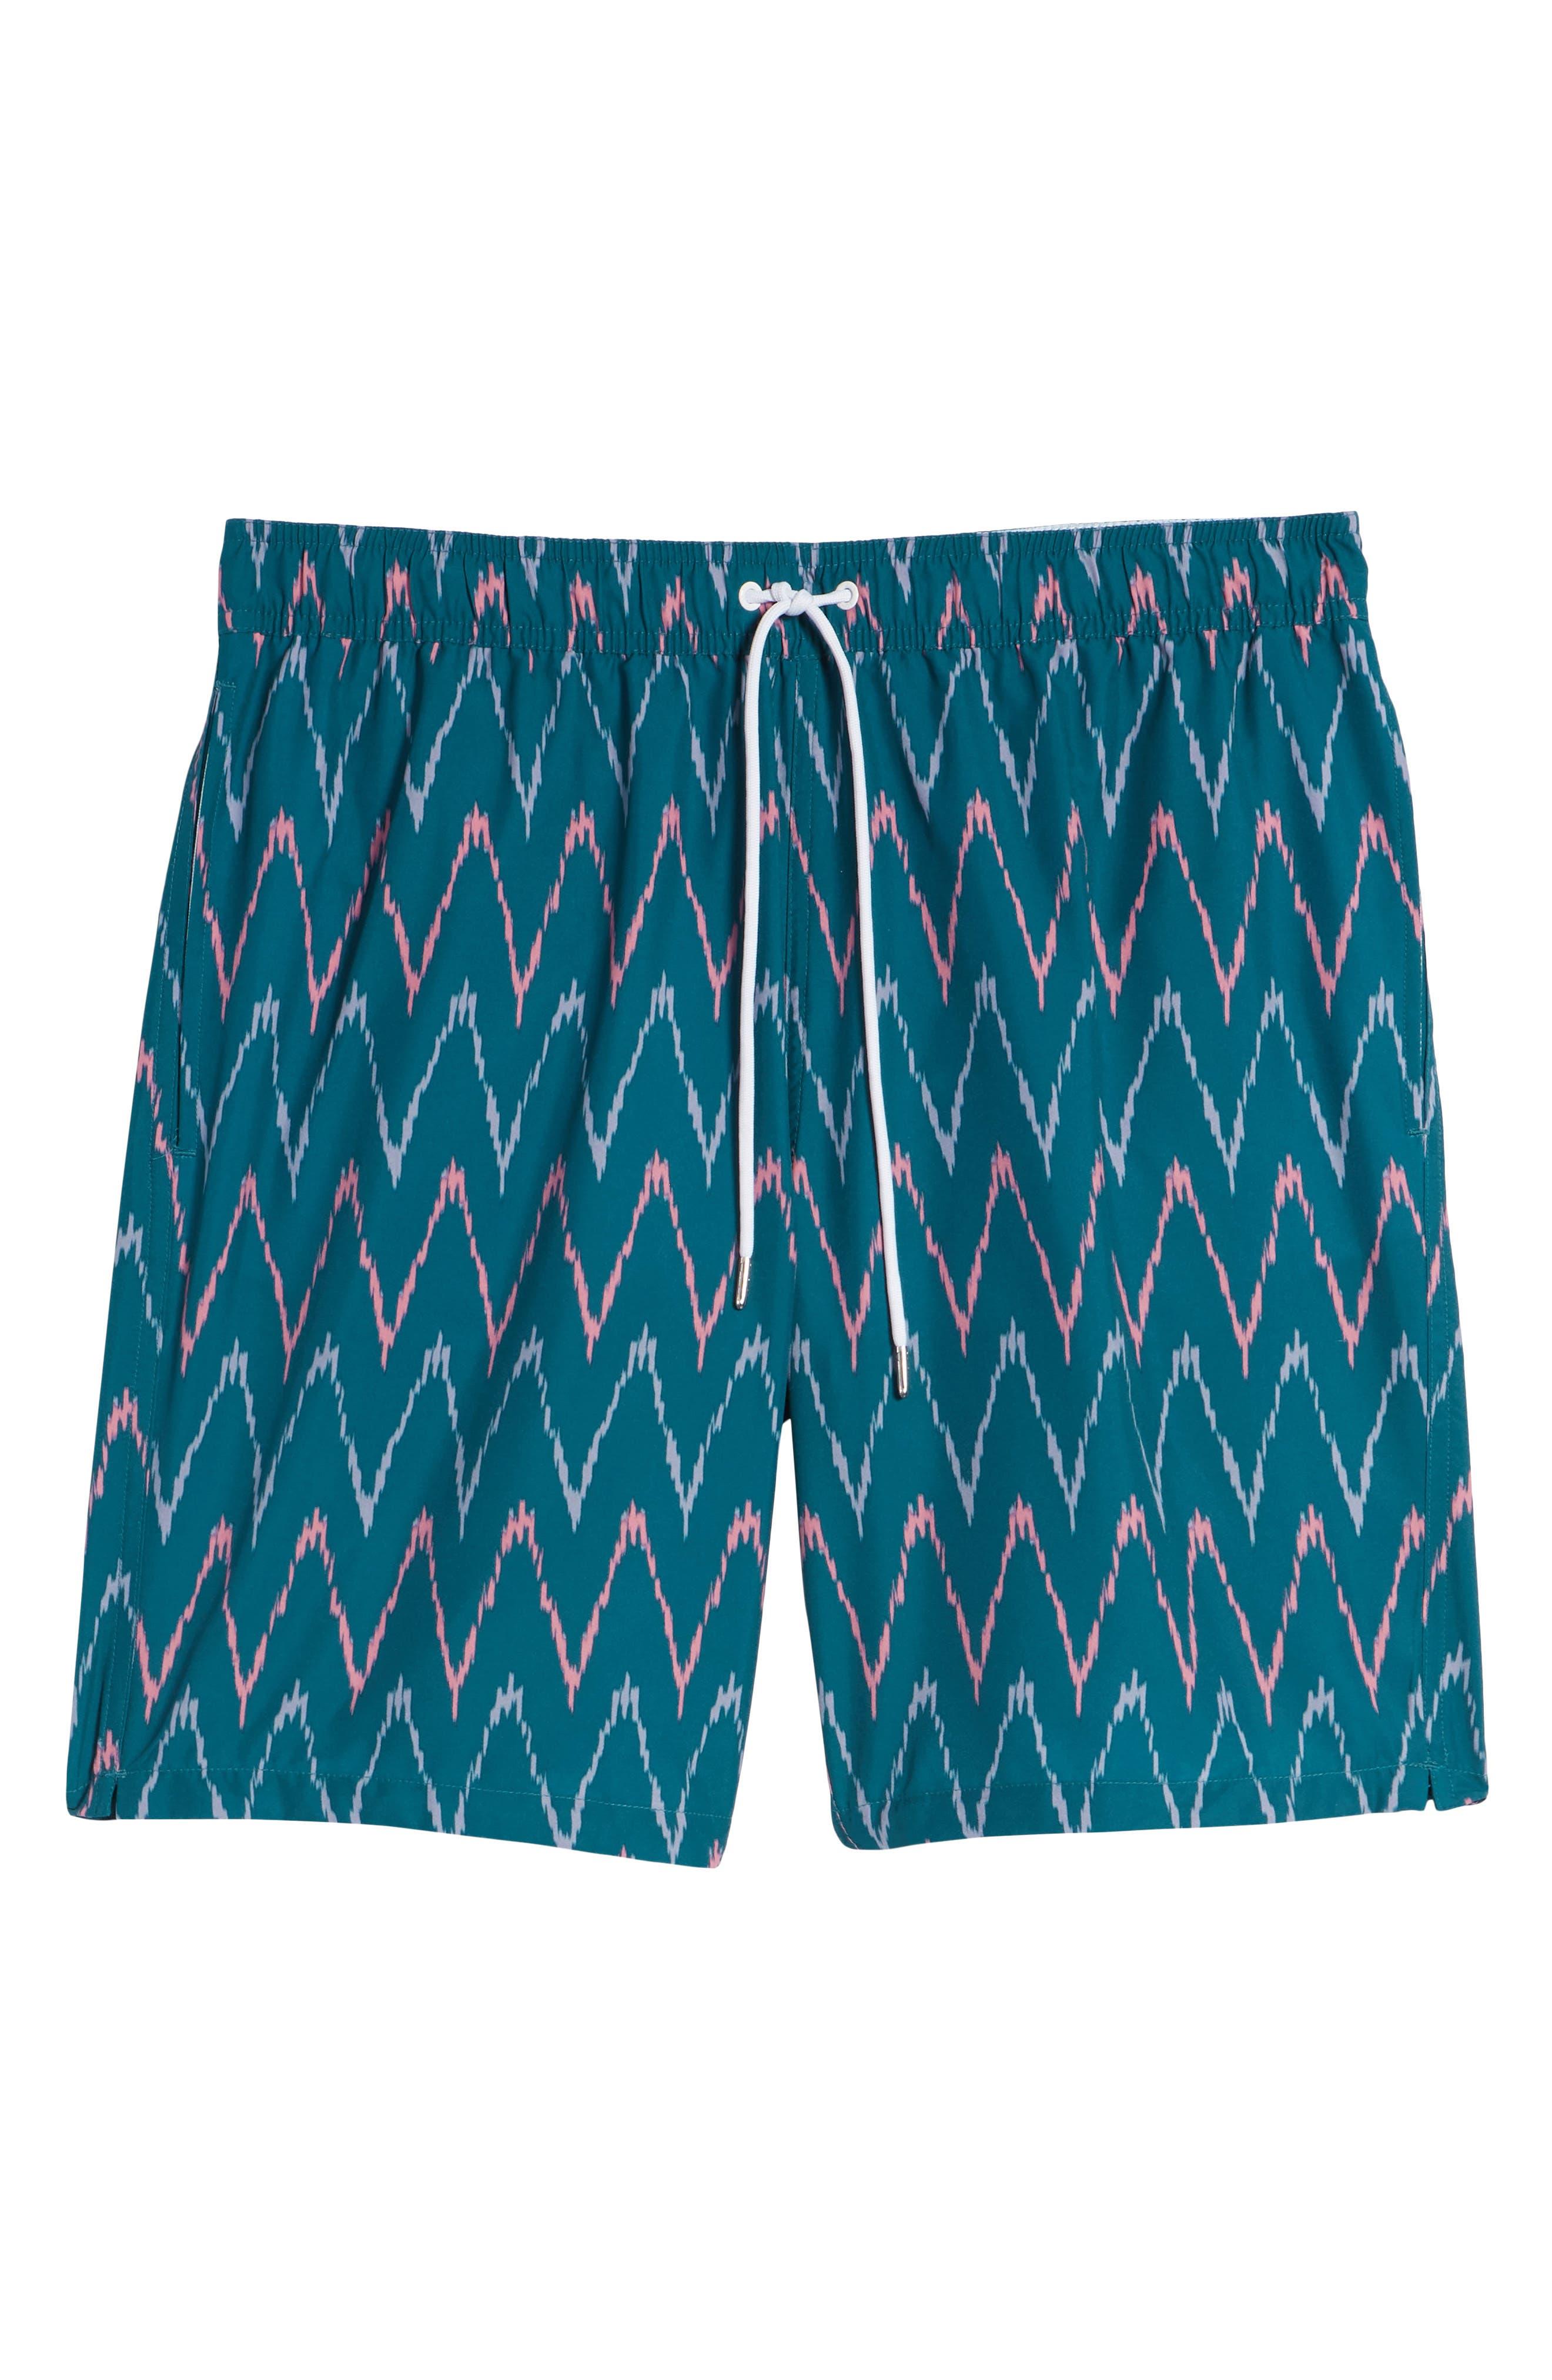 Banzai 9-Inch Swim Trunks,                             Alternate thumbnail 6, color,                             400